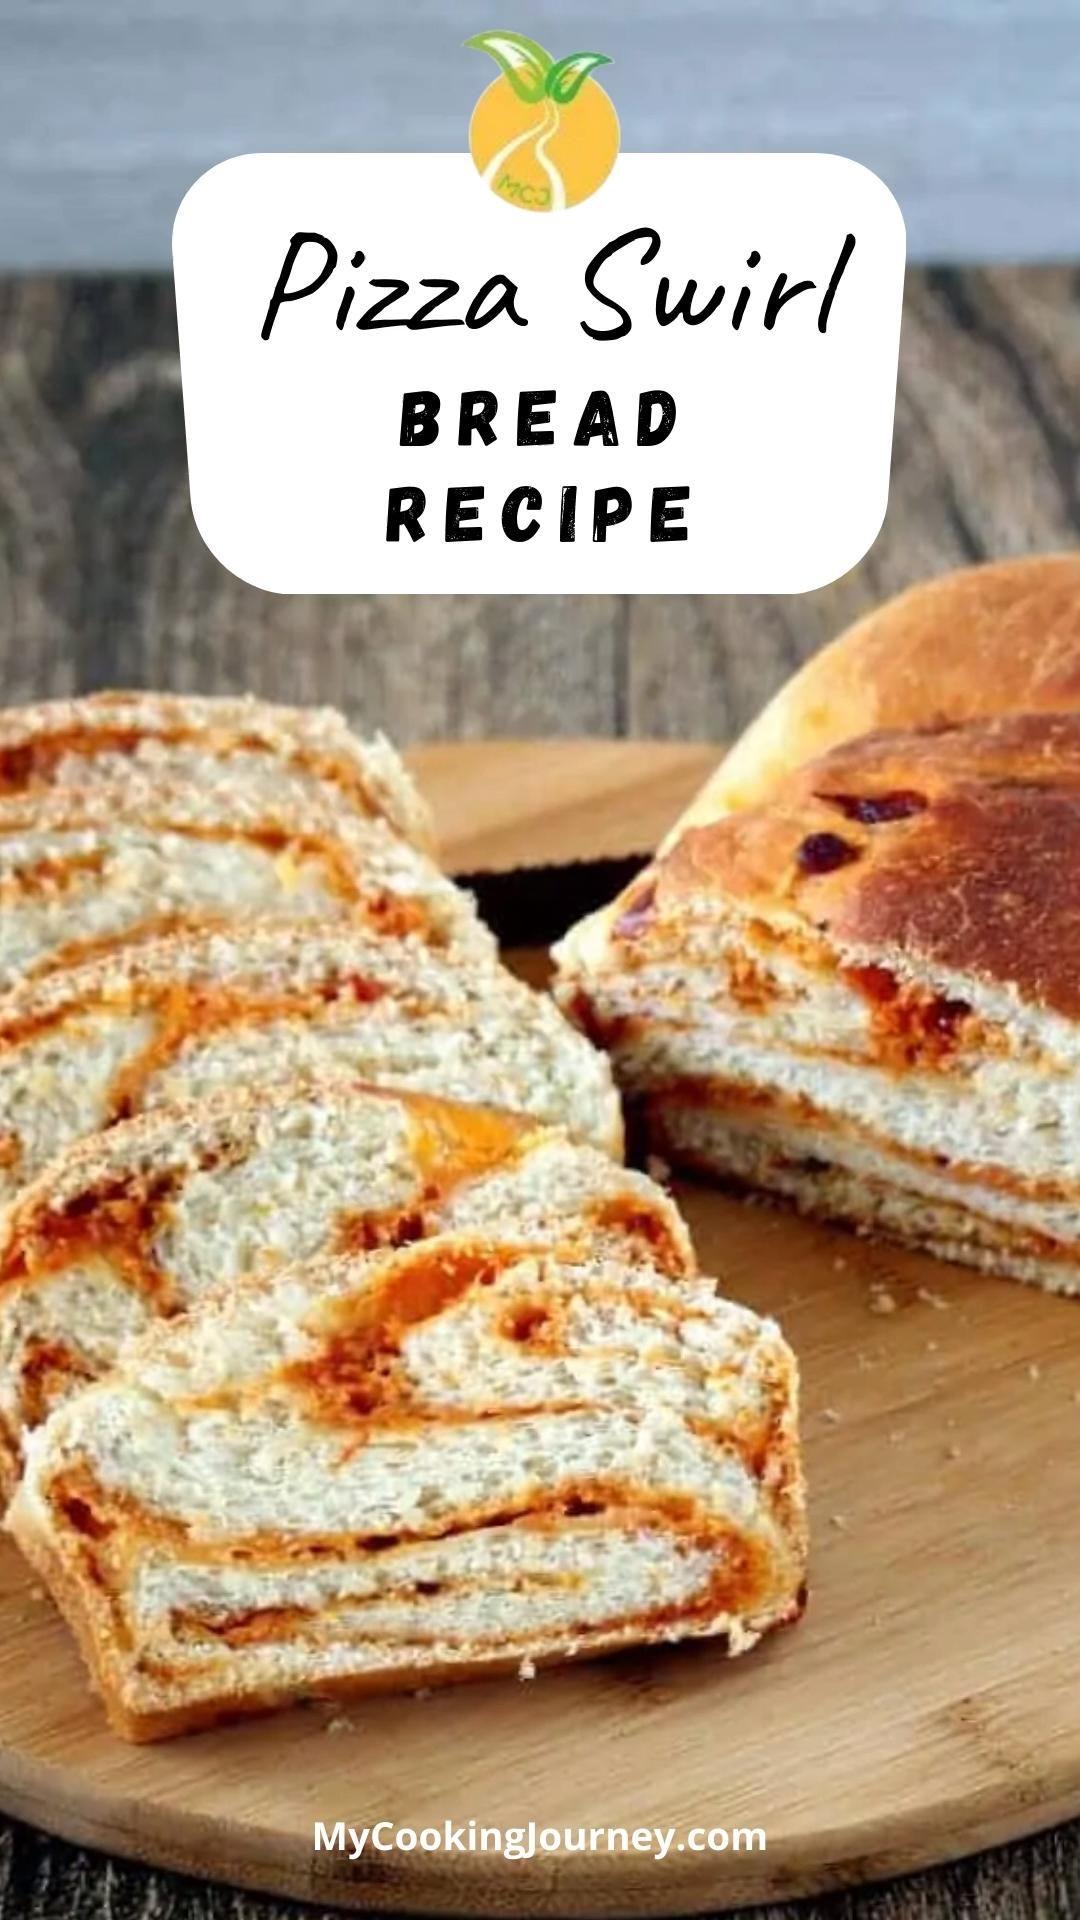 Pizza Swirl Bread Recipe My Cooking Journey Video Recipe Video In 2021 Swirled Bread Swirl Bread Recipe Recipes